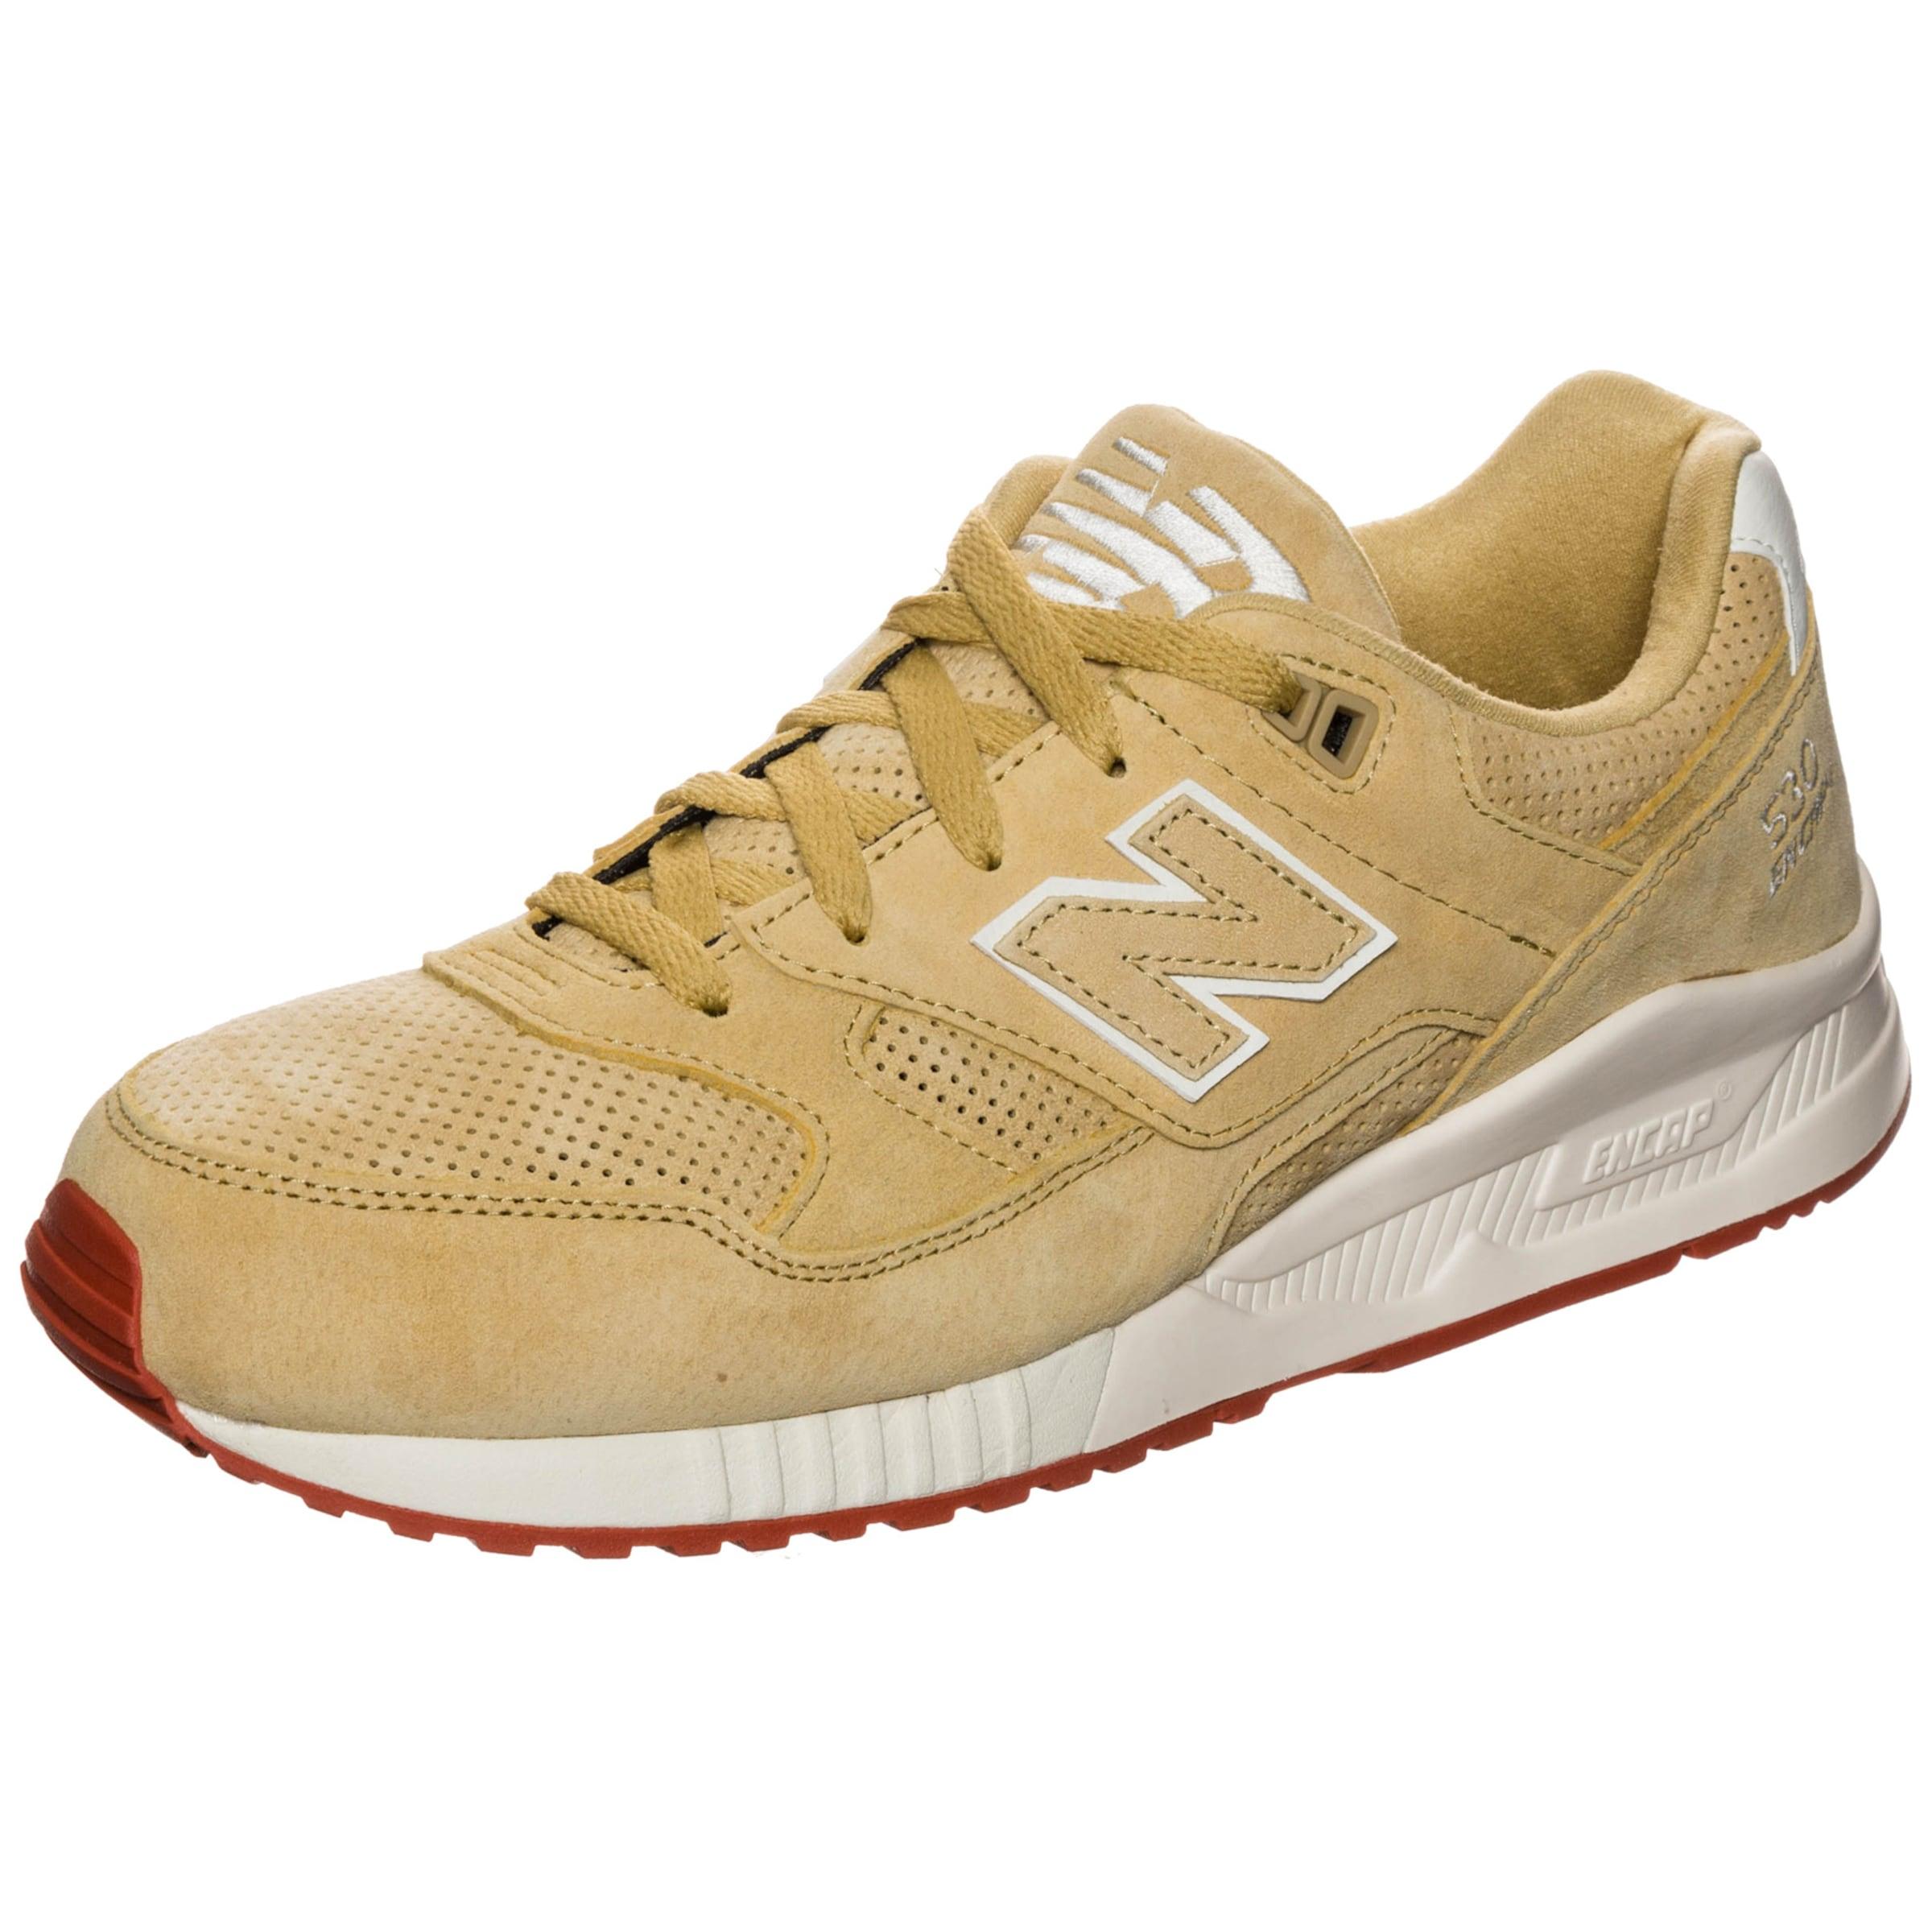 new balance Sneaker M530-VCC-D Verschleißfeste billige Schuhe